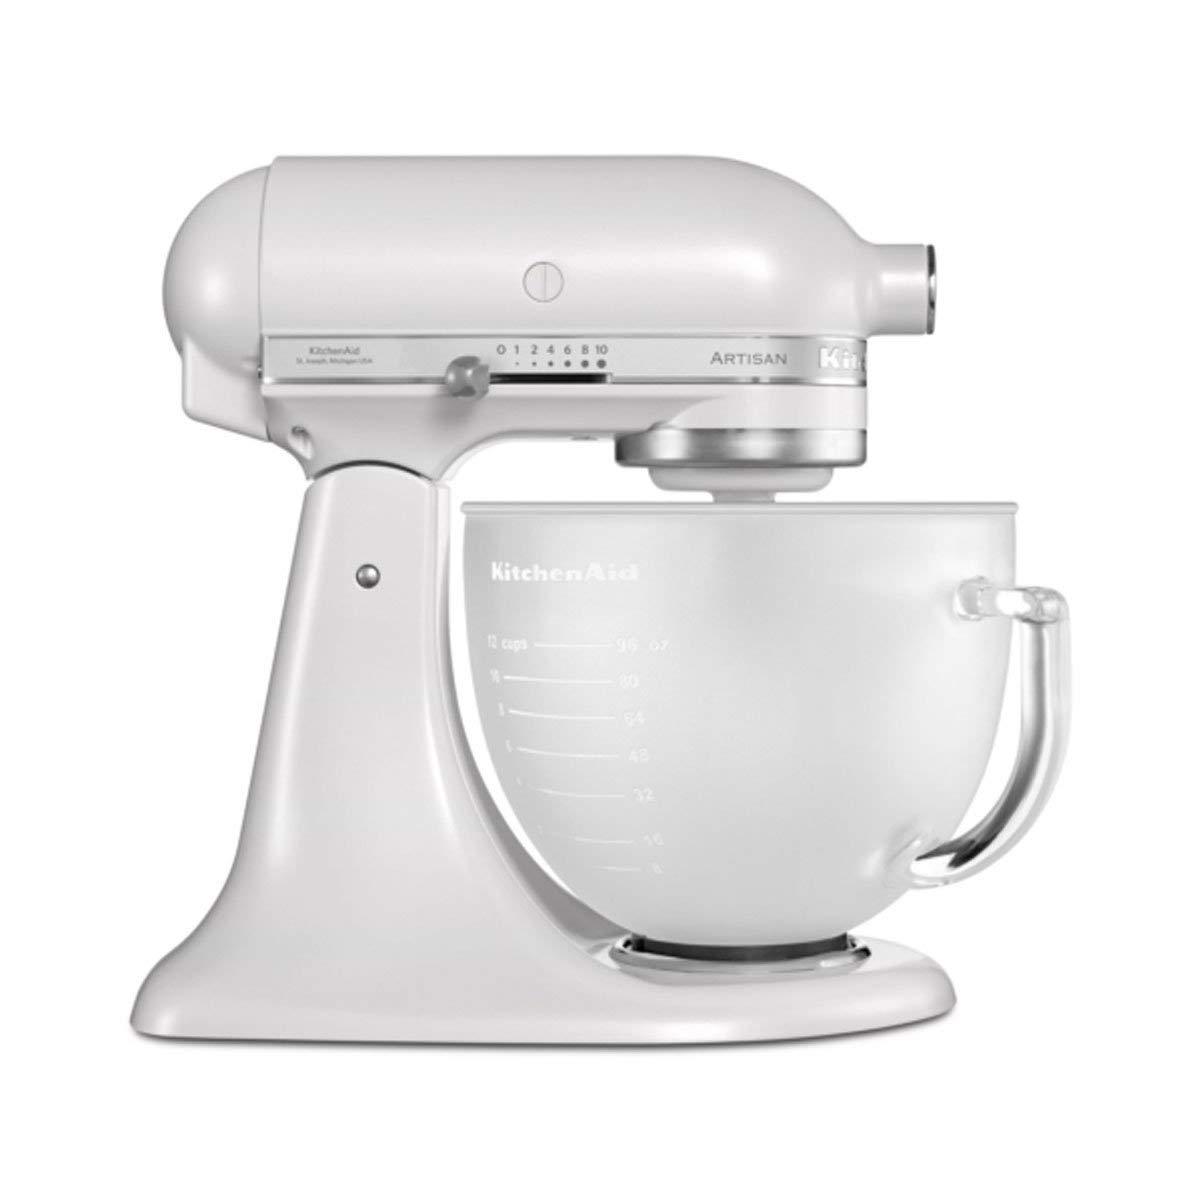 Amazon.de: KitchenAid 5KSM156EFP Küchenmaschine mit kippbarem ...